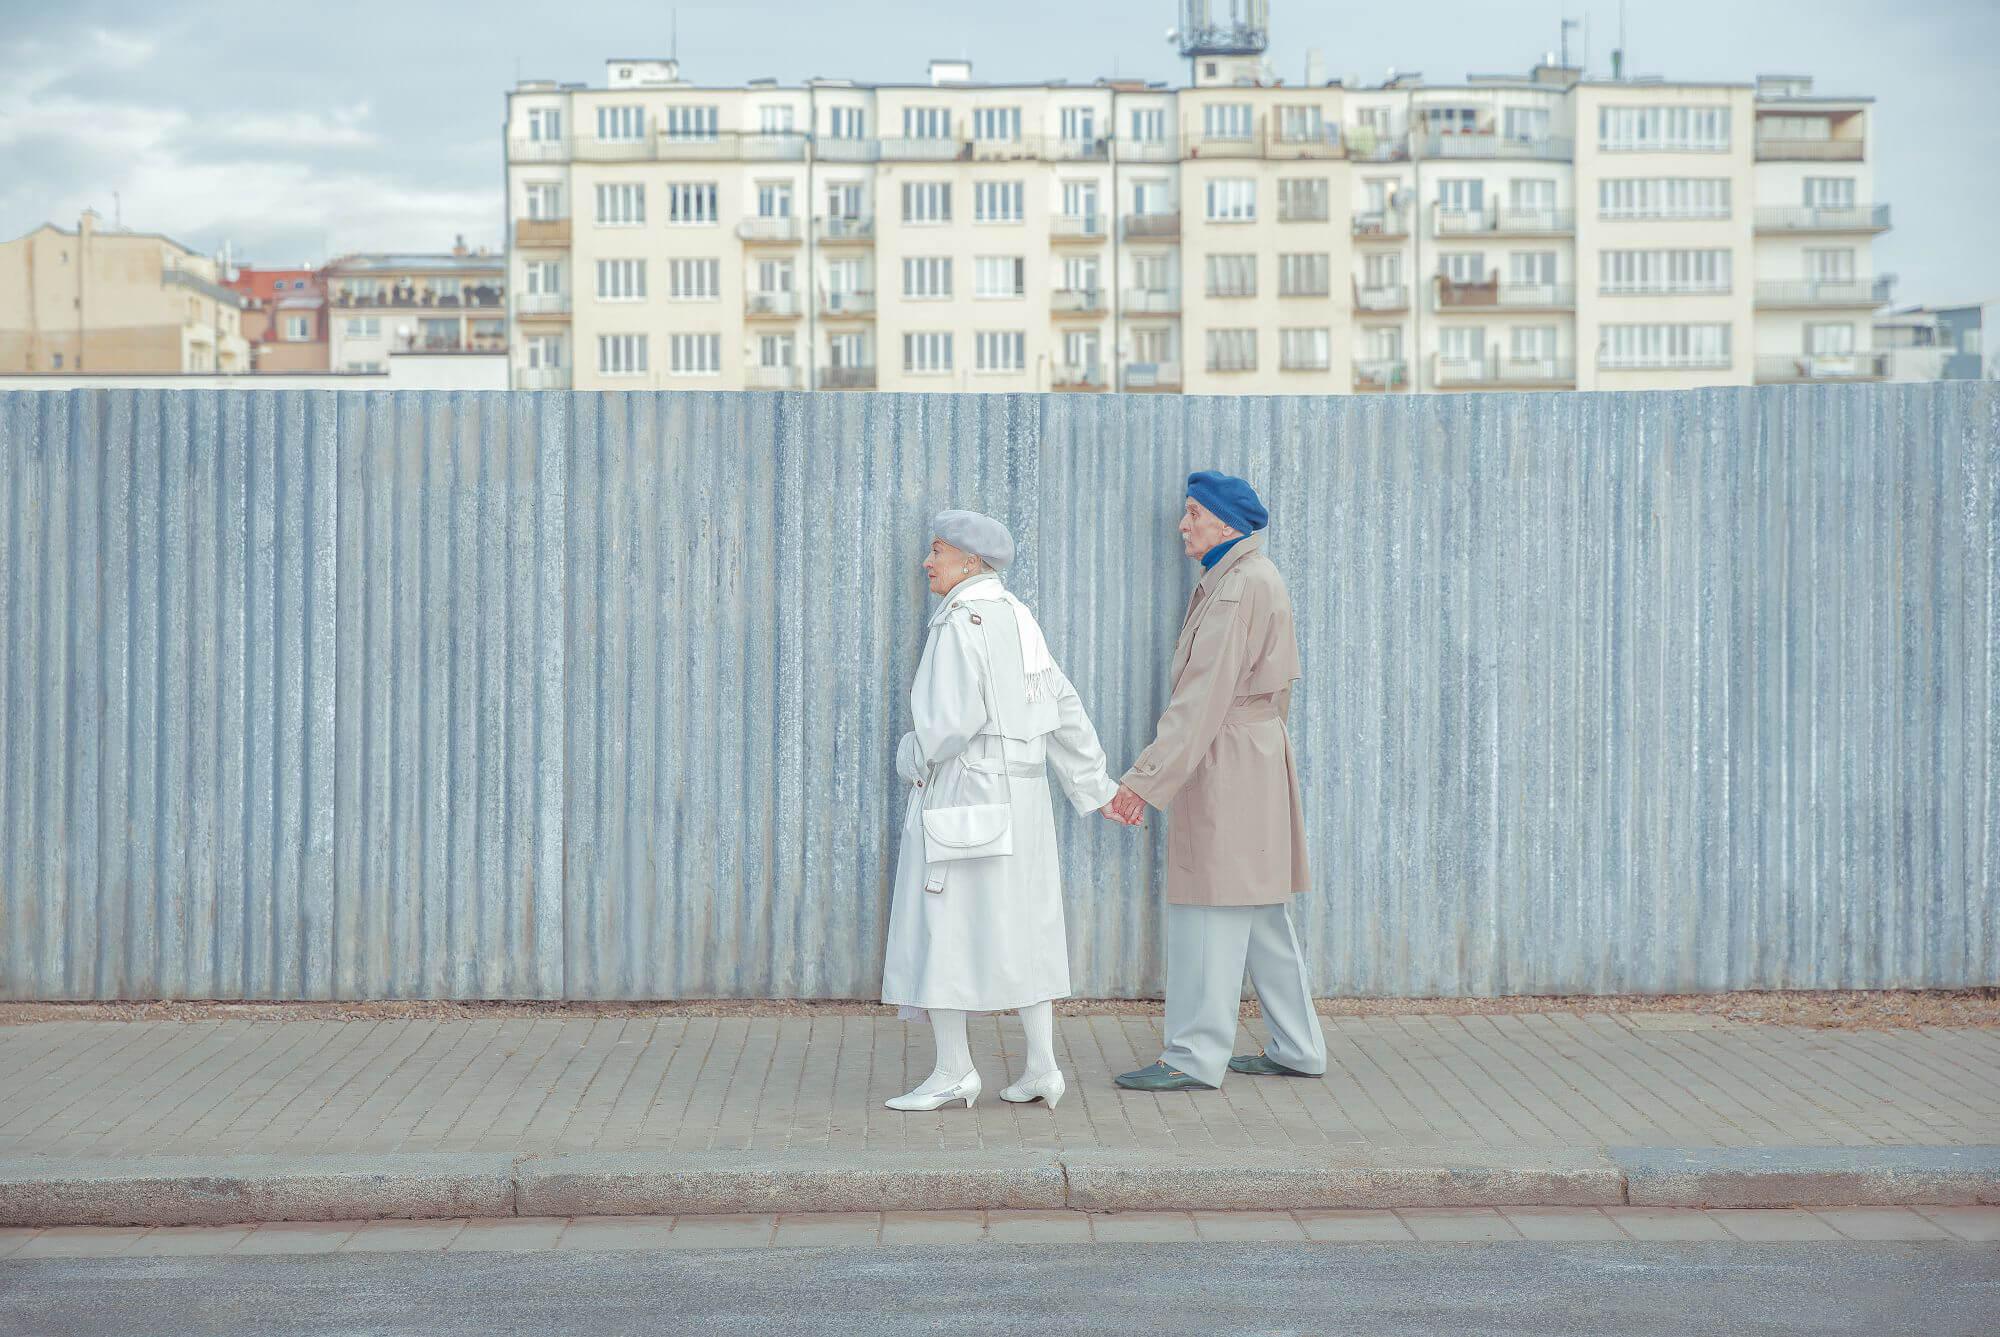 foto: ©Maria Svarbova - Slovakia (Art)